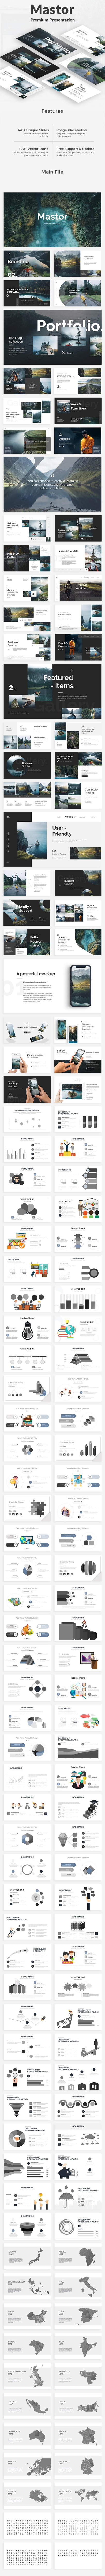 Mastor Premium Design Google Slide Template - Google Slides Presentation Templates